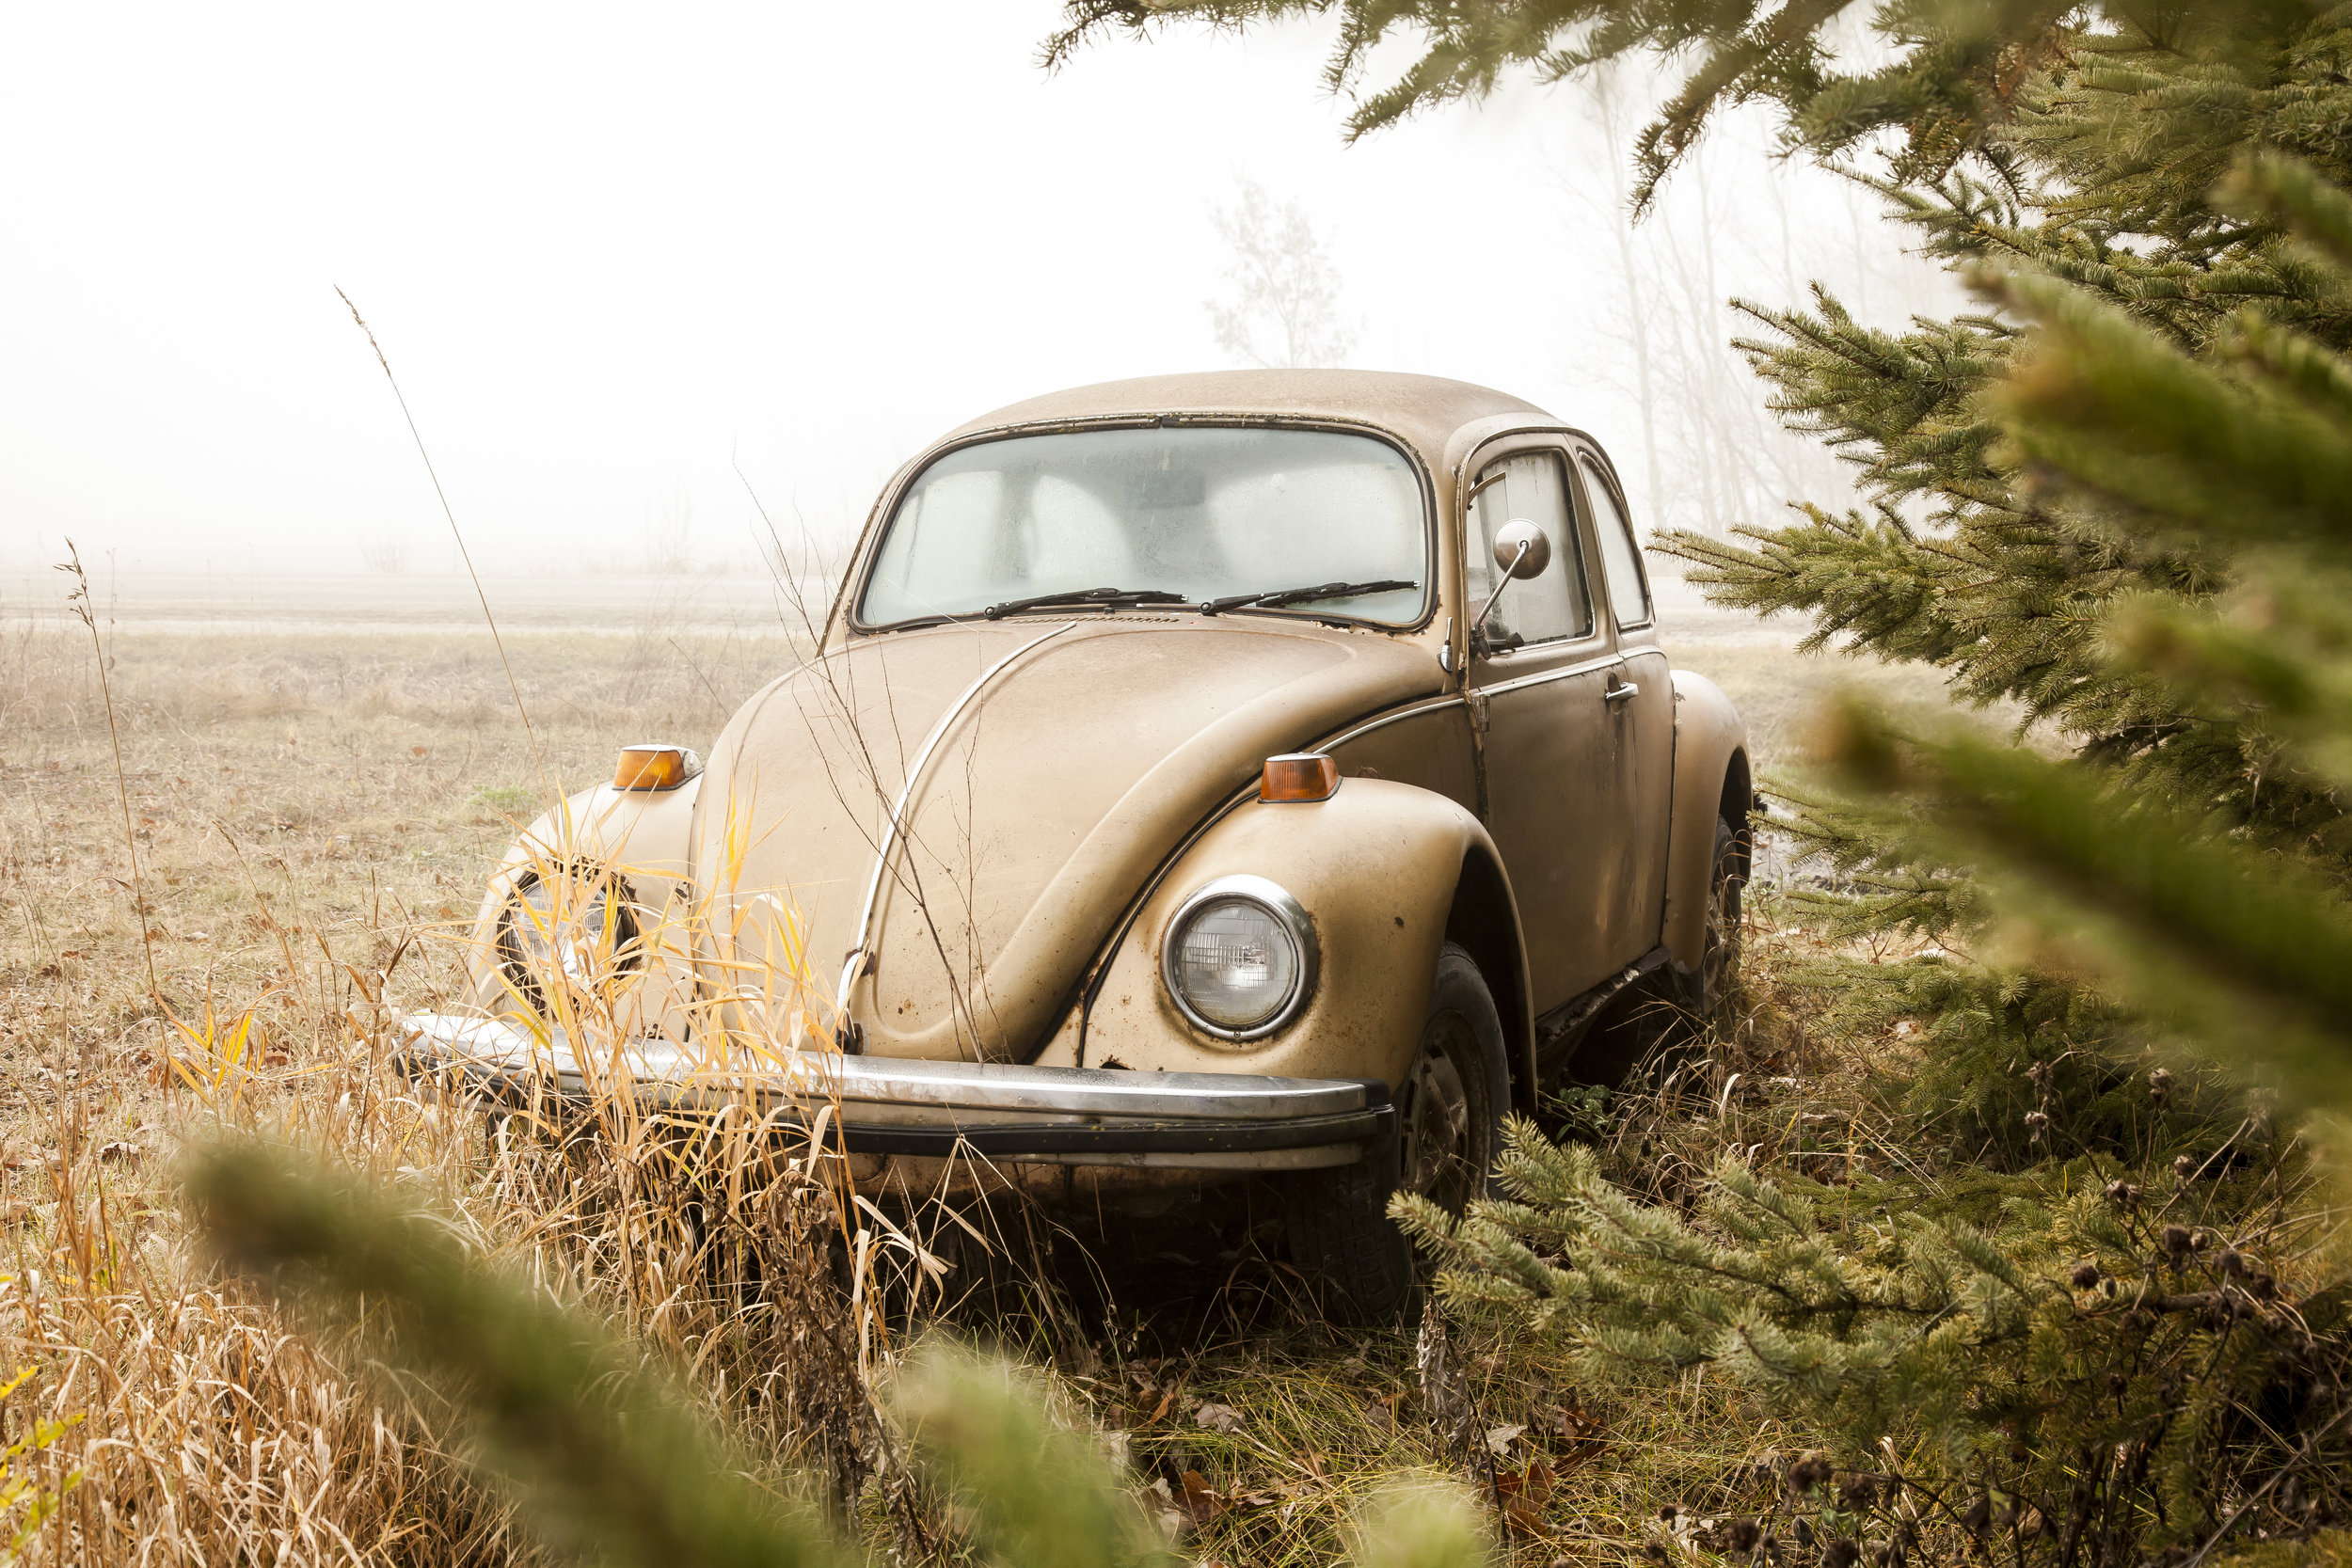 VW_GAGE_FLETHCER_4.jpg